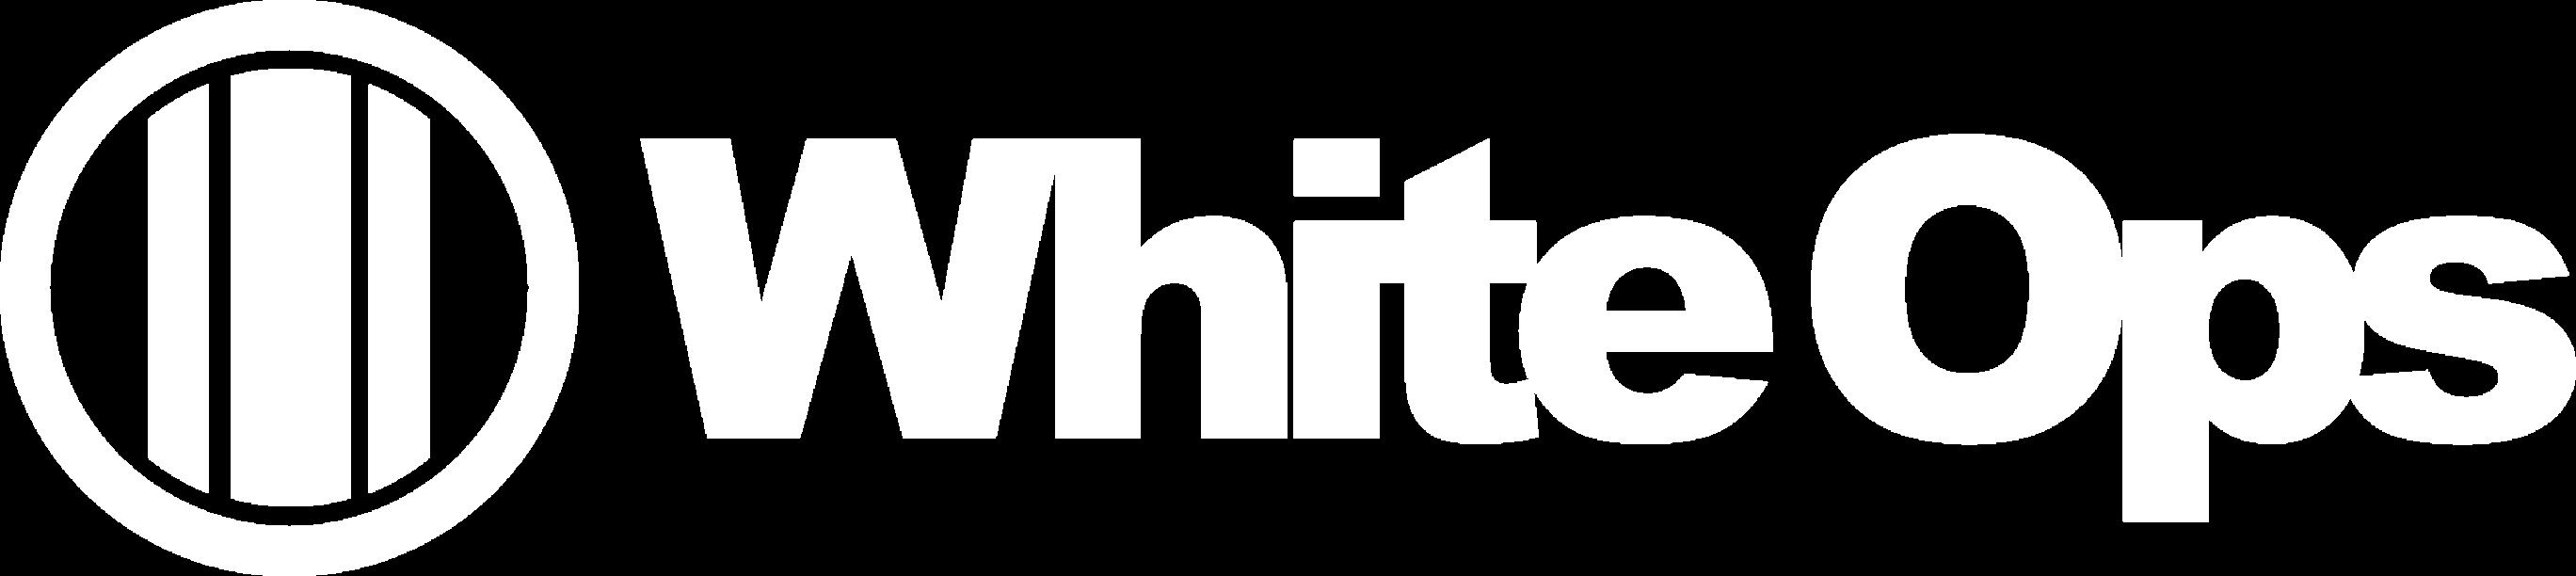 WhiteOps_Logo_White.png